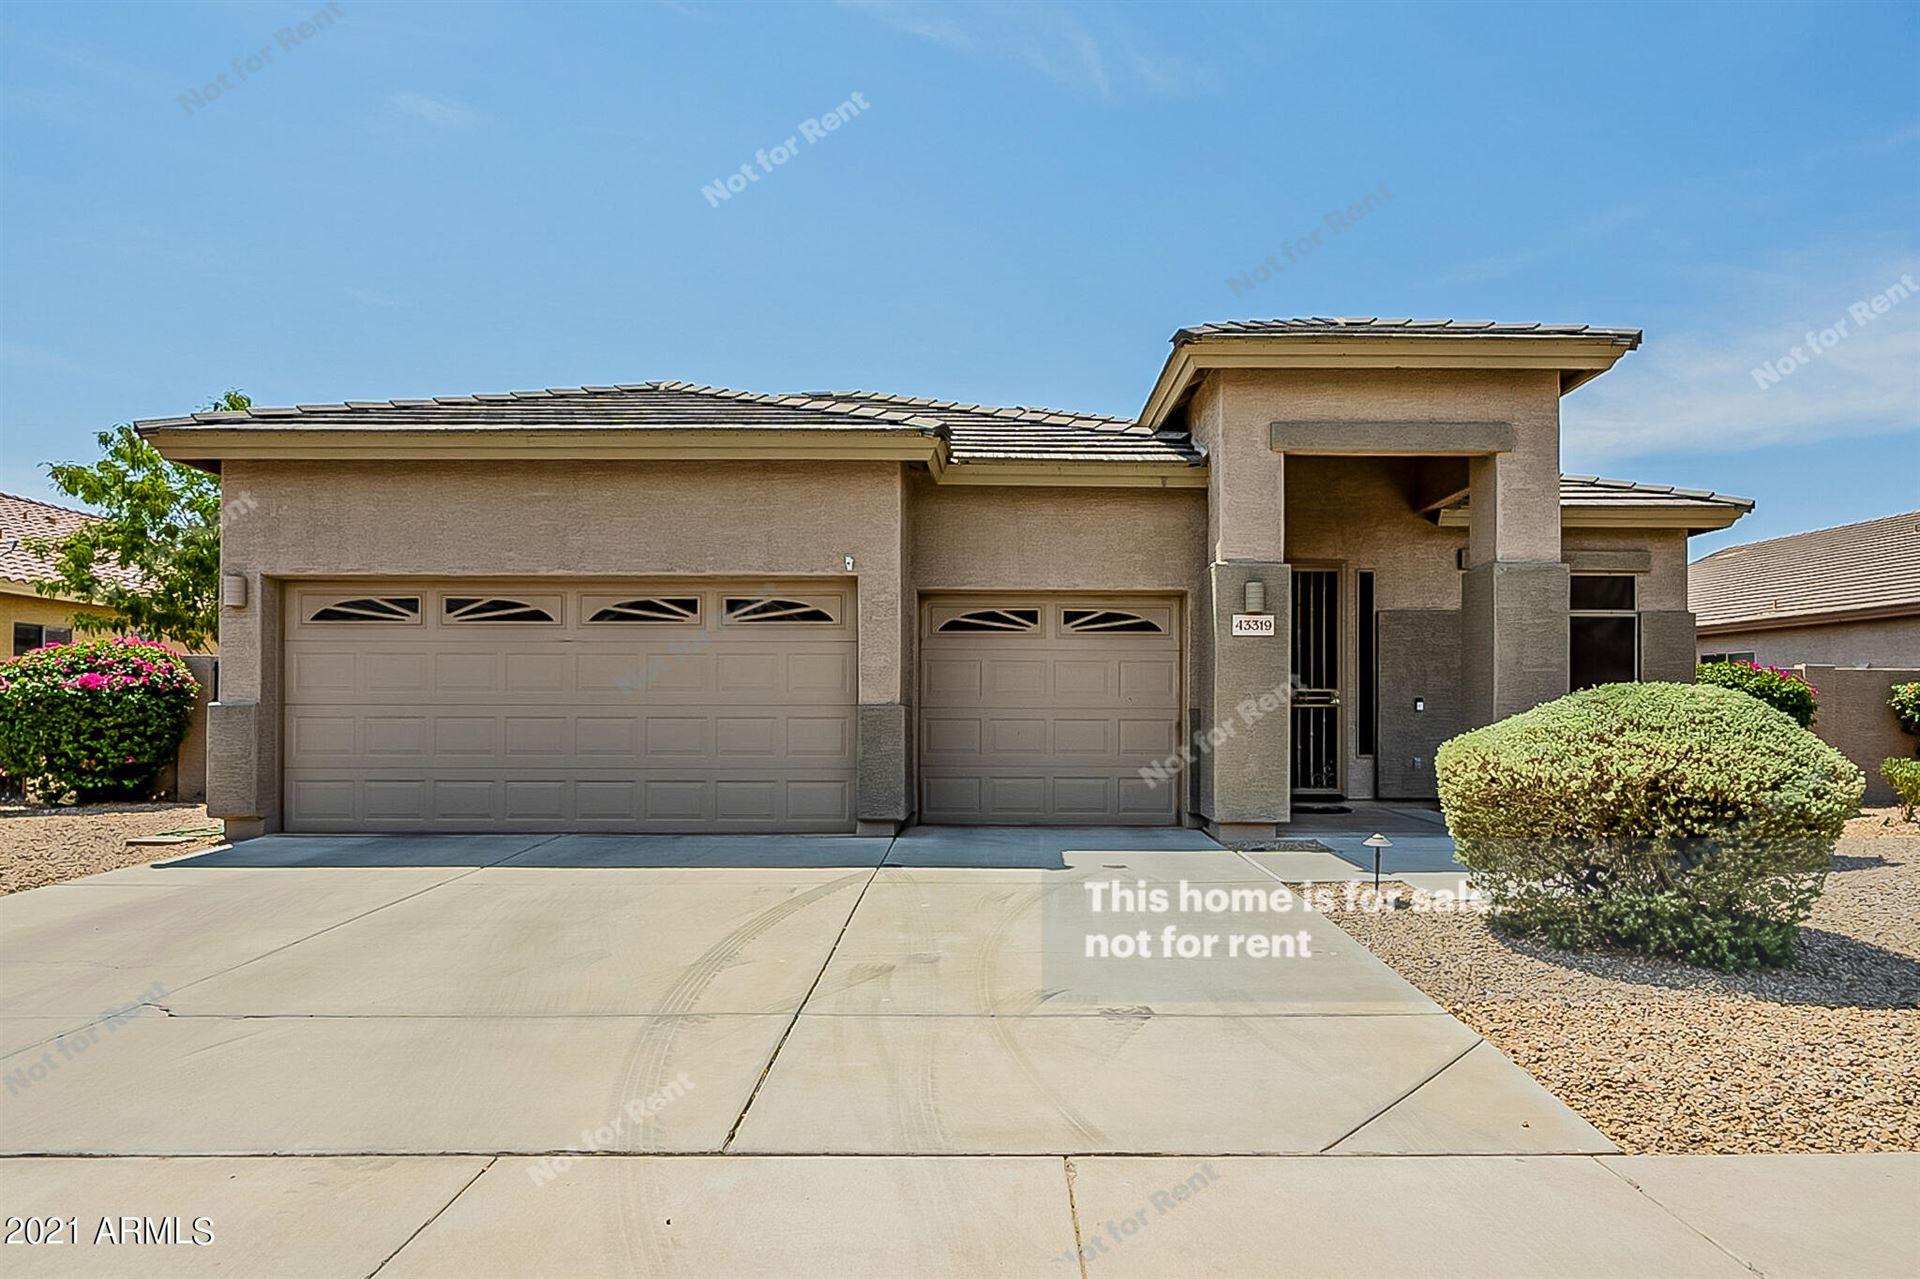 Photo for 43319 W OAKLAND Court, Maricopa, AZ 85138 (MLS # 6251854)